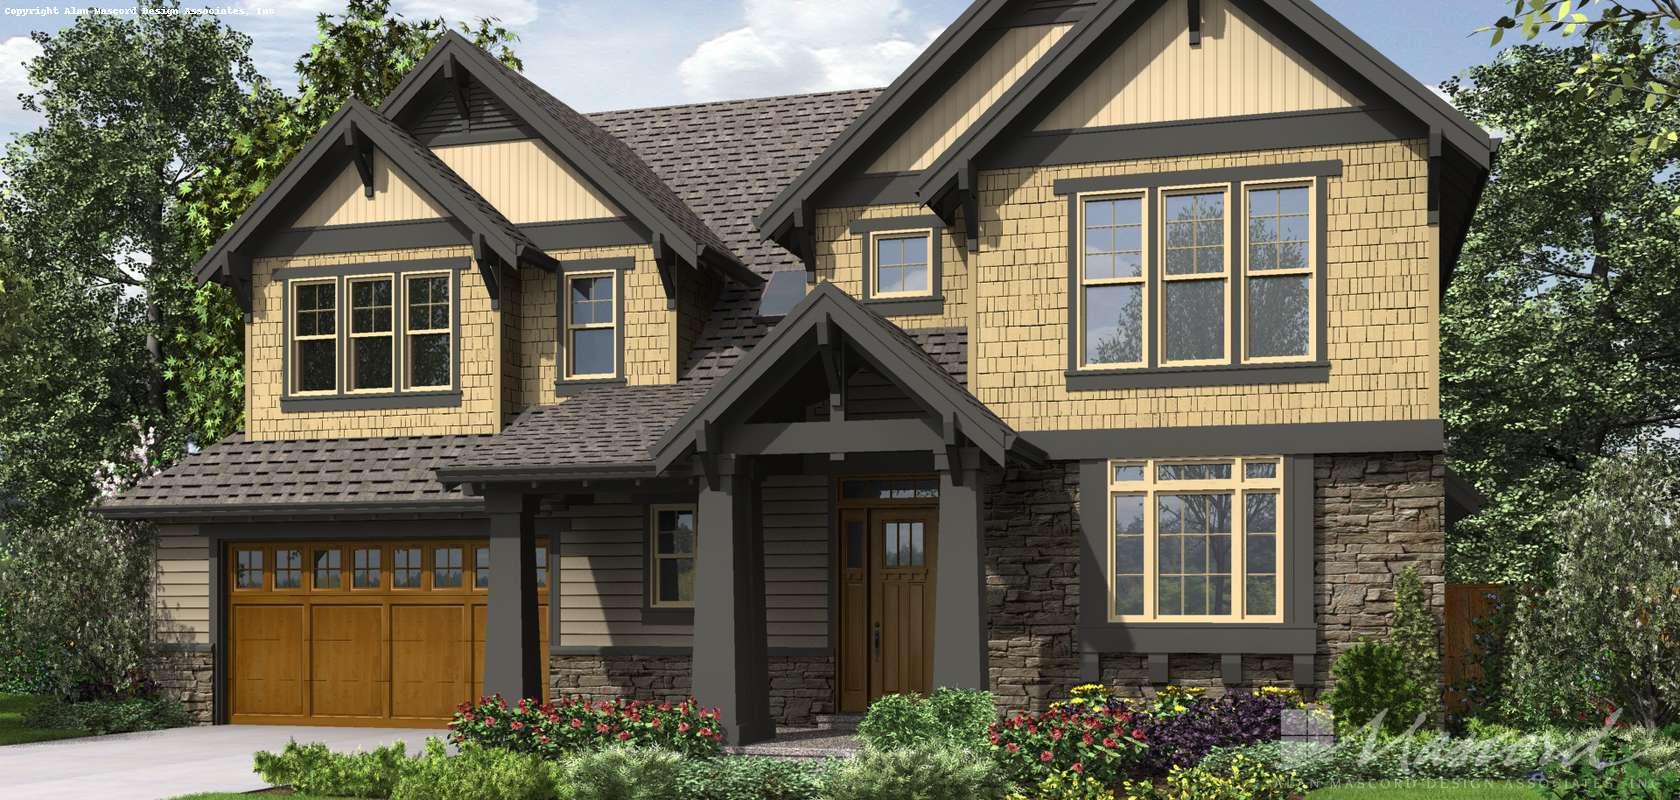 Mascord House Plan 23105: The Ridley